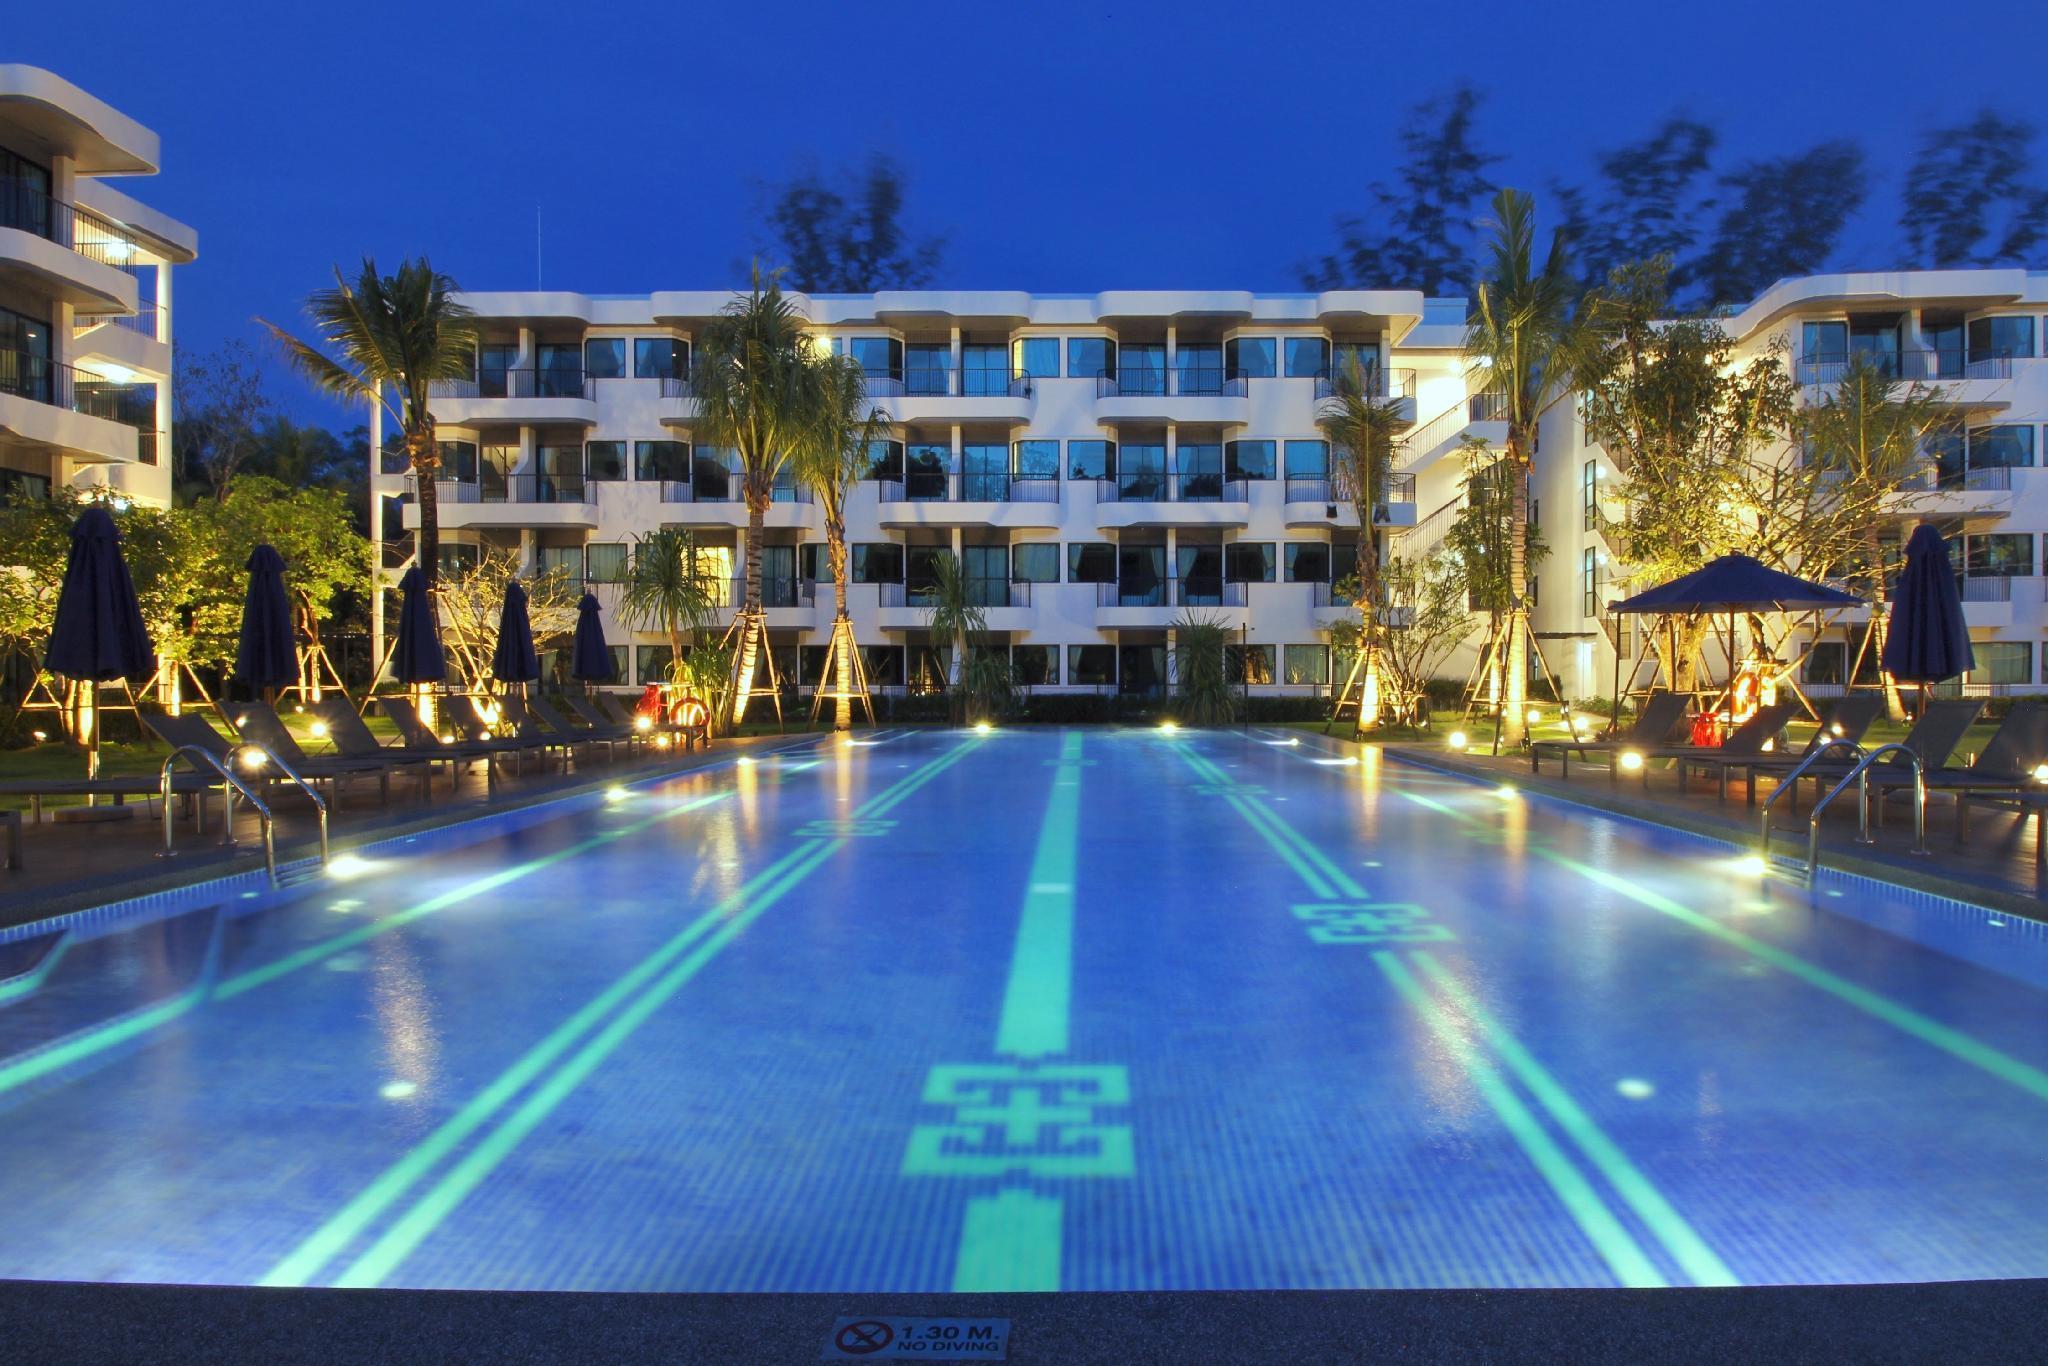 Holiday Inn Express Krabi Ao Nang Beach ฮอลิเดย์อินน์ เอ็กซ์เพรส กระบี่ หาดอ่าวนาง